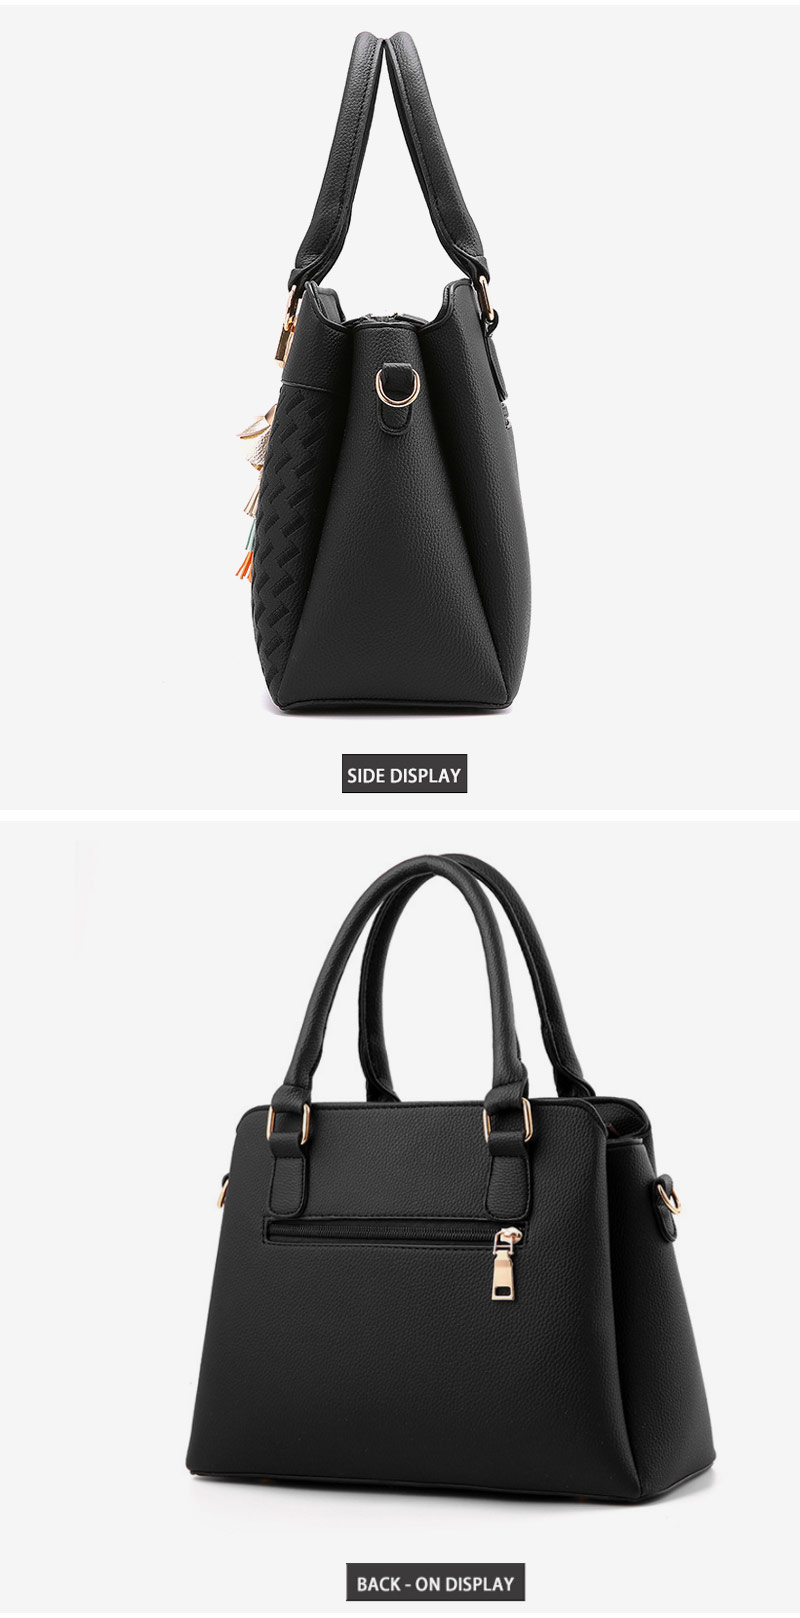 STSR Leather Clutch Bag Female Handbag Luxury Beach Tote Ms. Fringe Shoulder Bag Tote gray one size 16